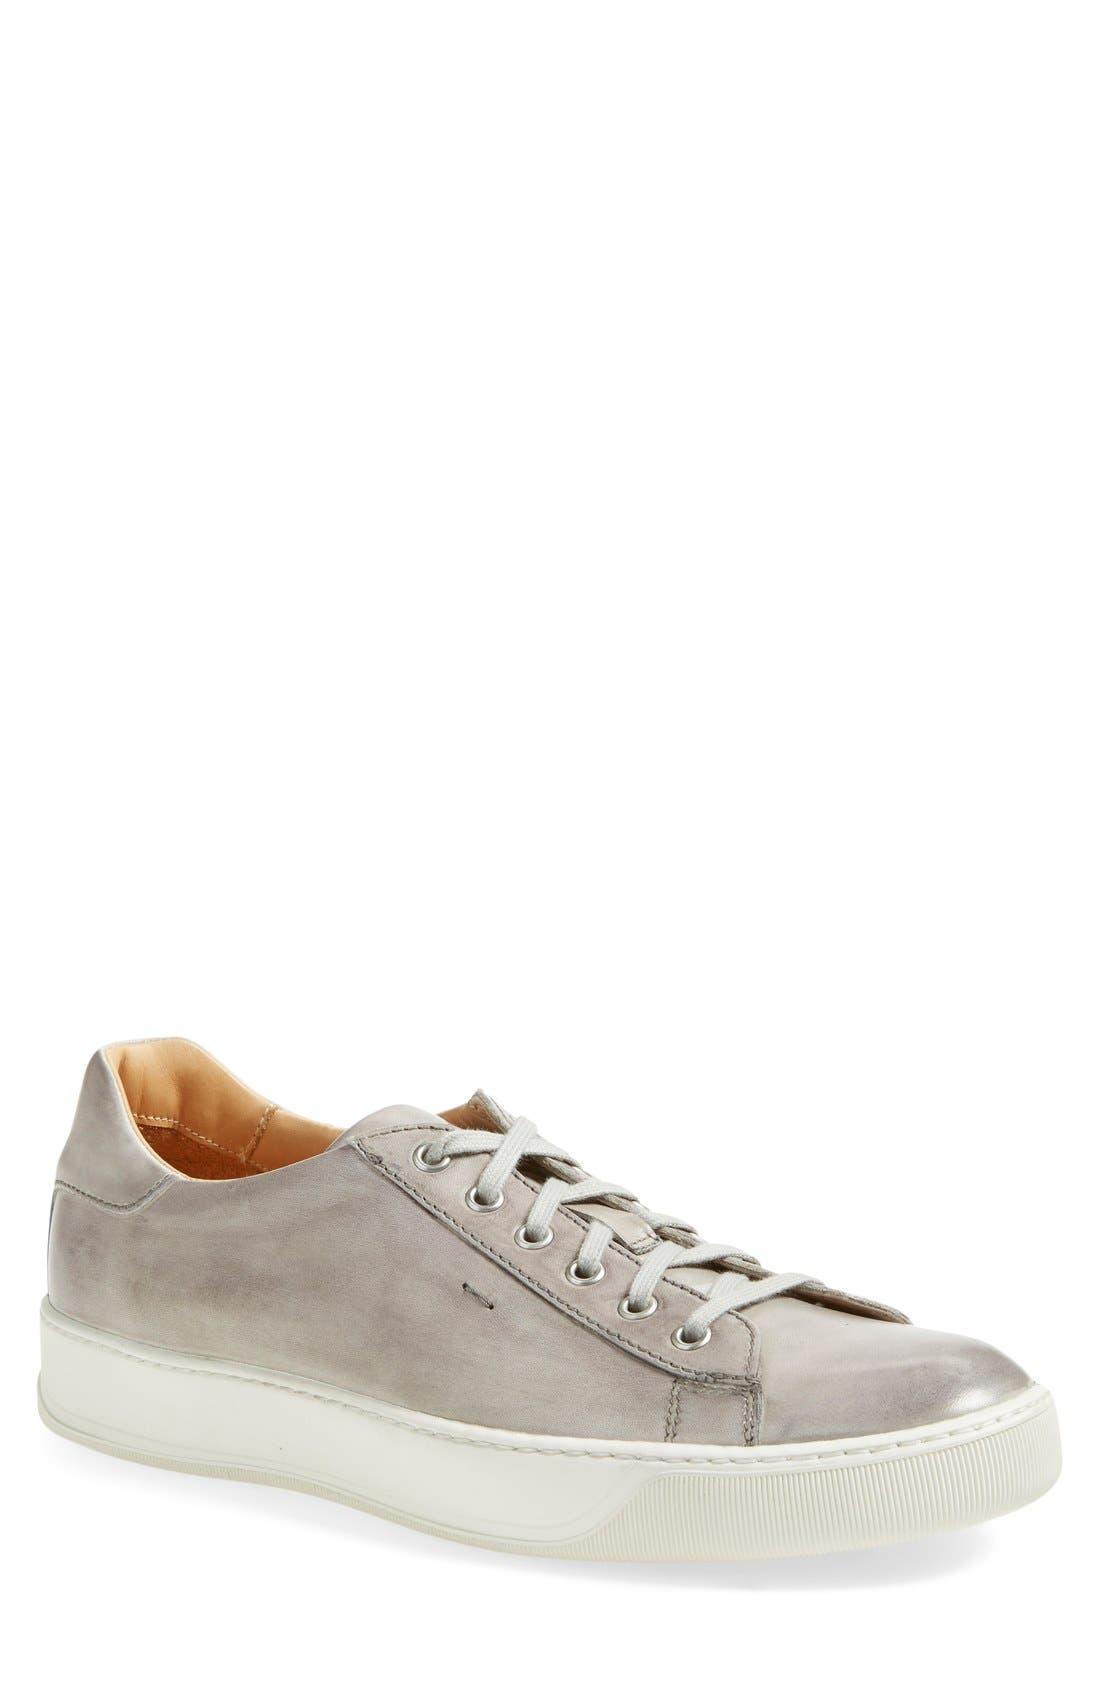 'Apache' Lace-Up Sneaker,                             Main thumbnail 2, color,